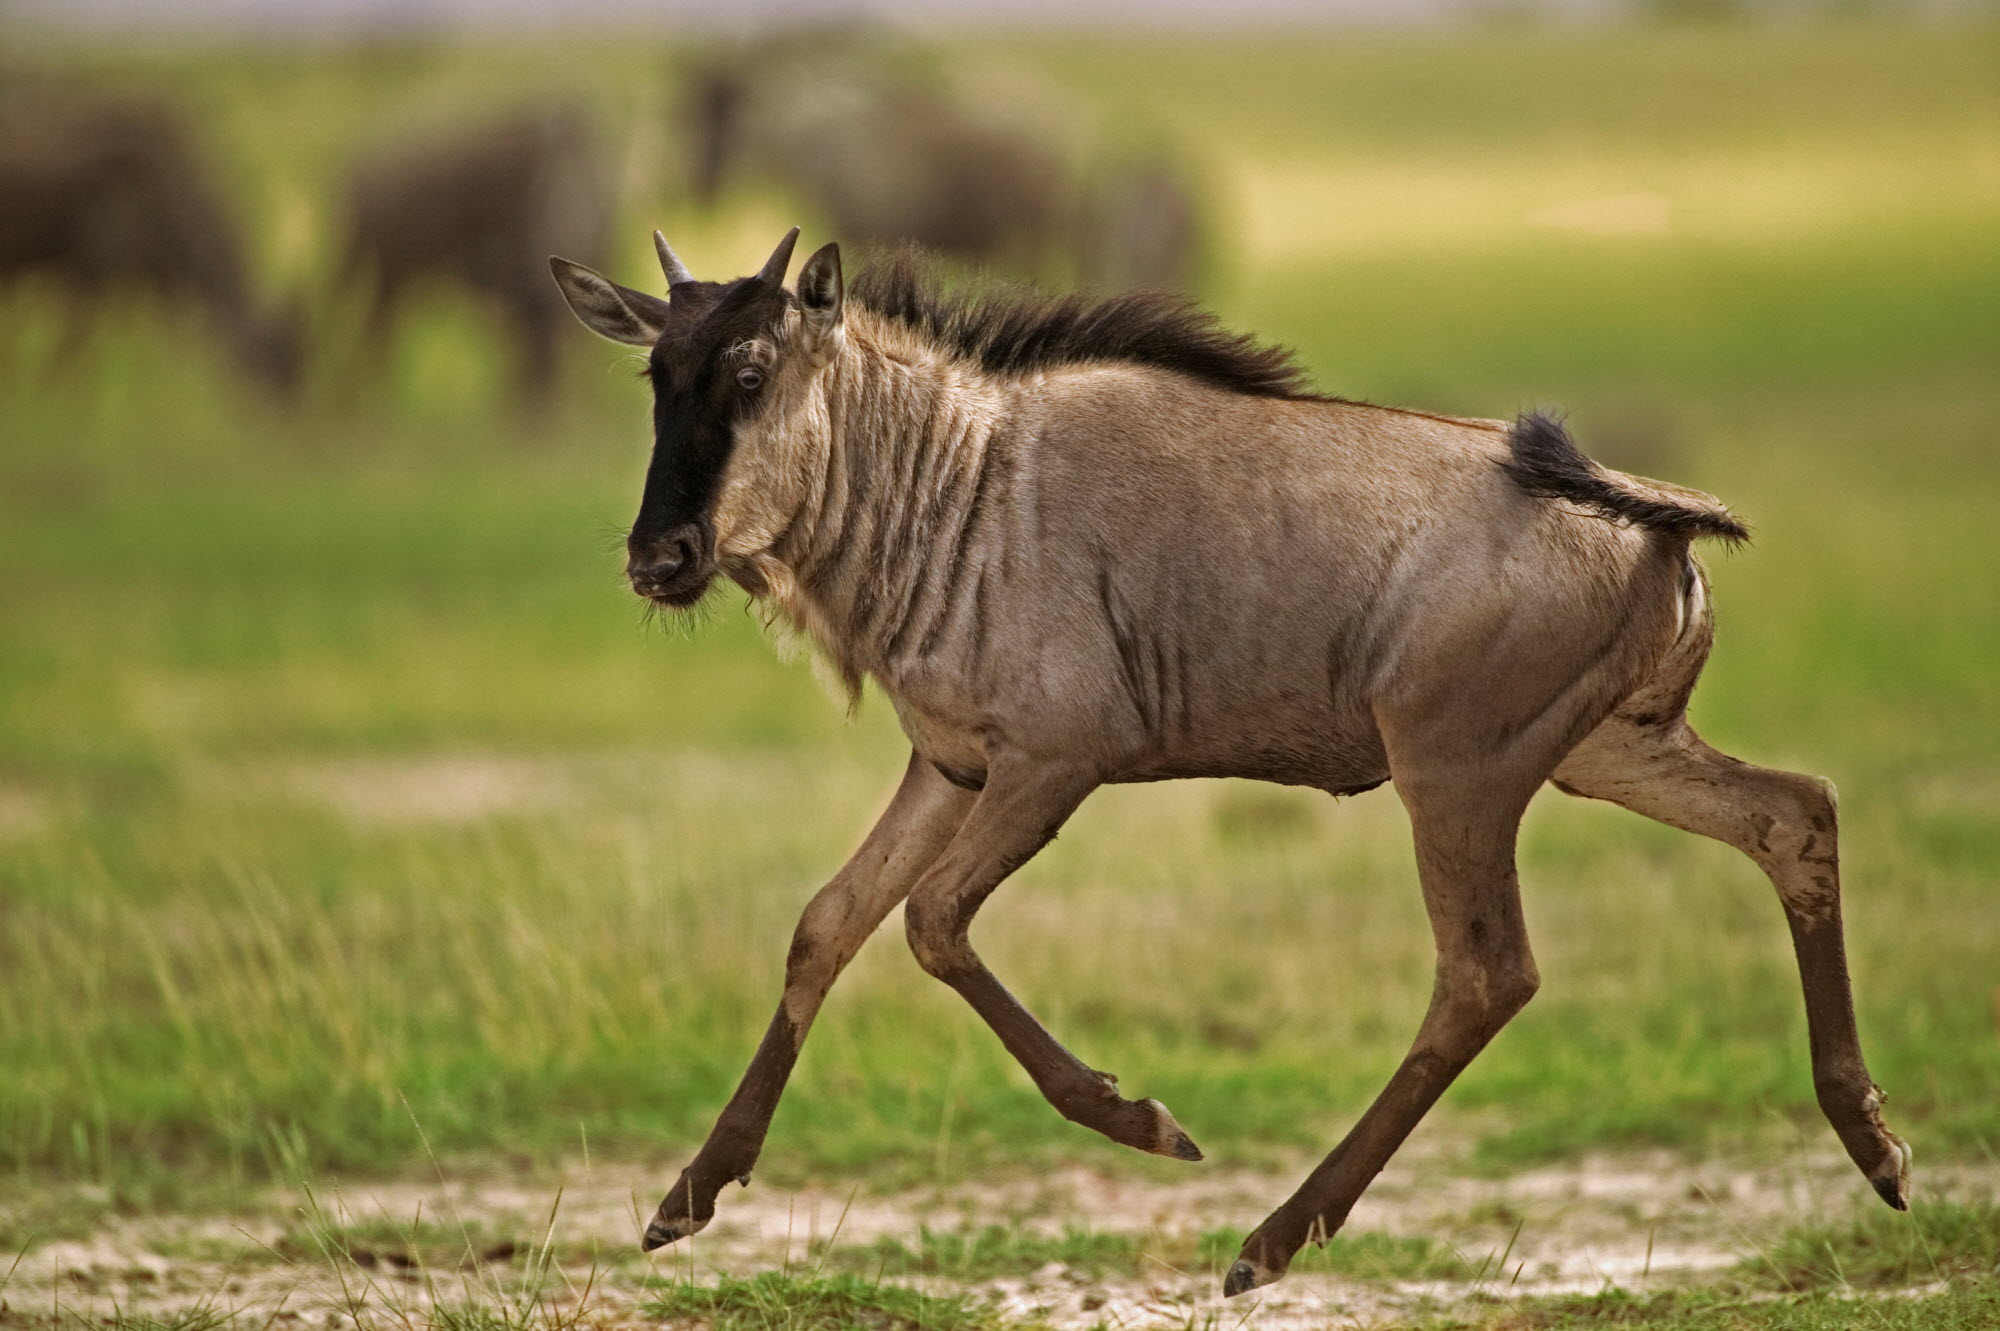 Blue wildebeest on the move. Photo credit: Martin Harvey/WildscreenExchange